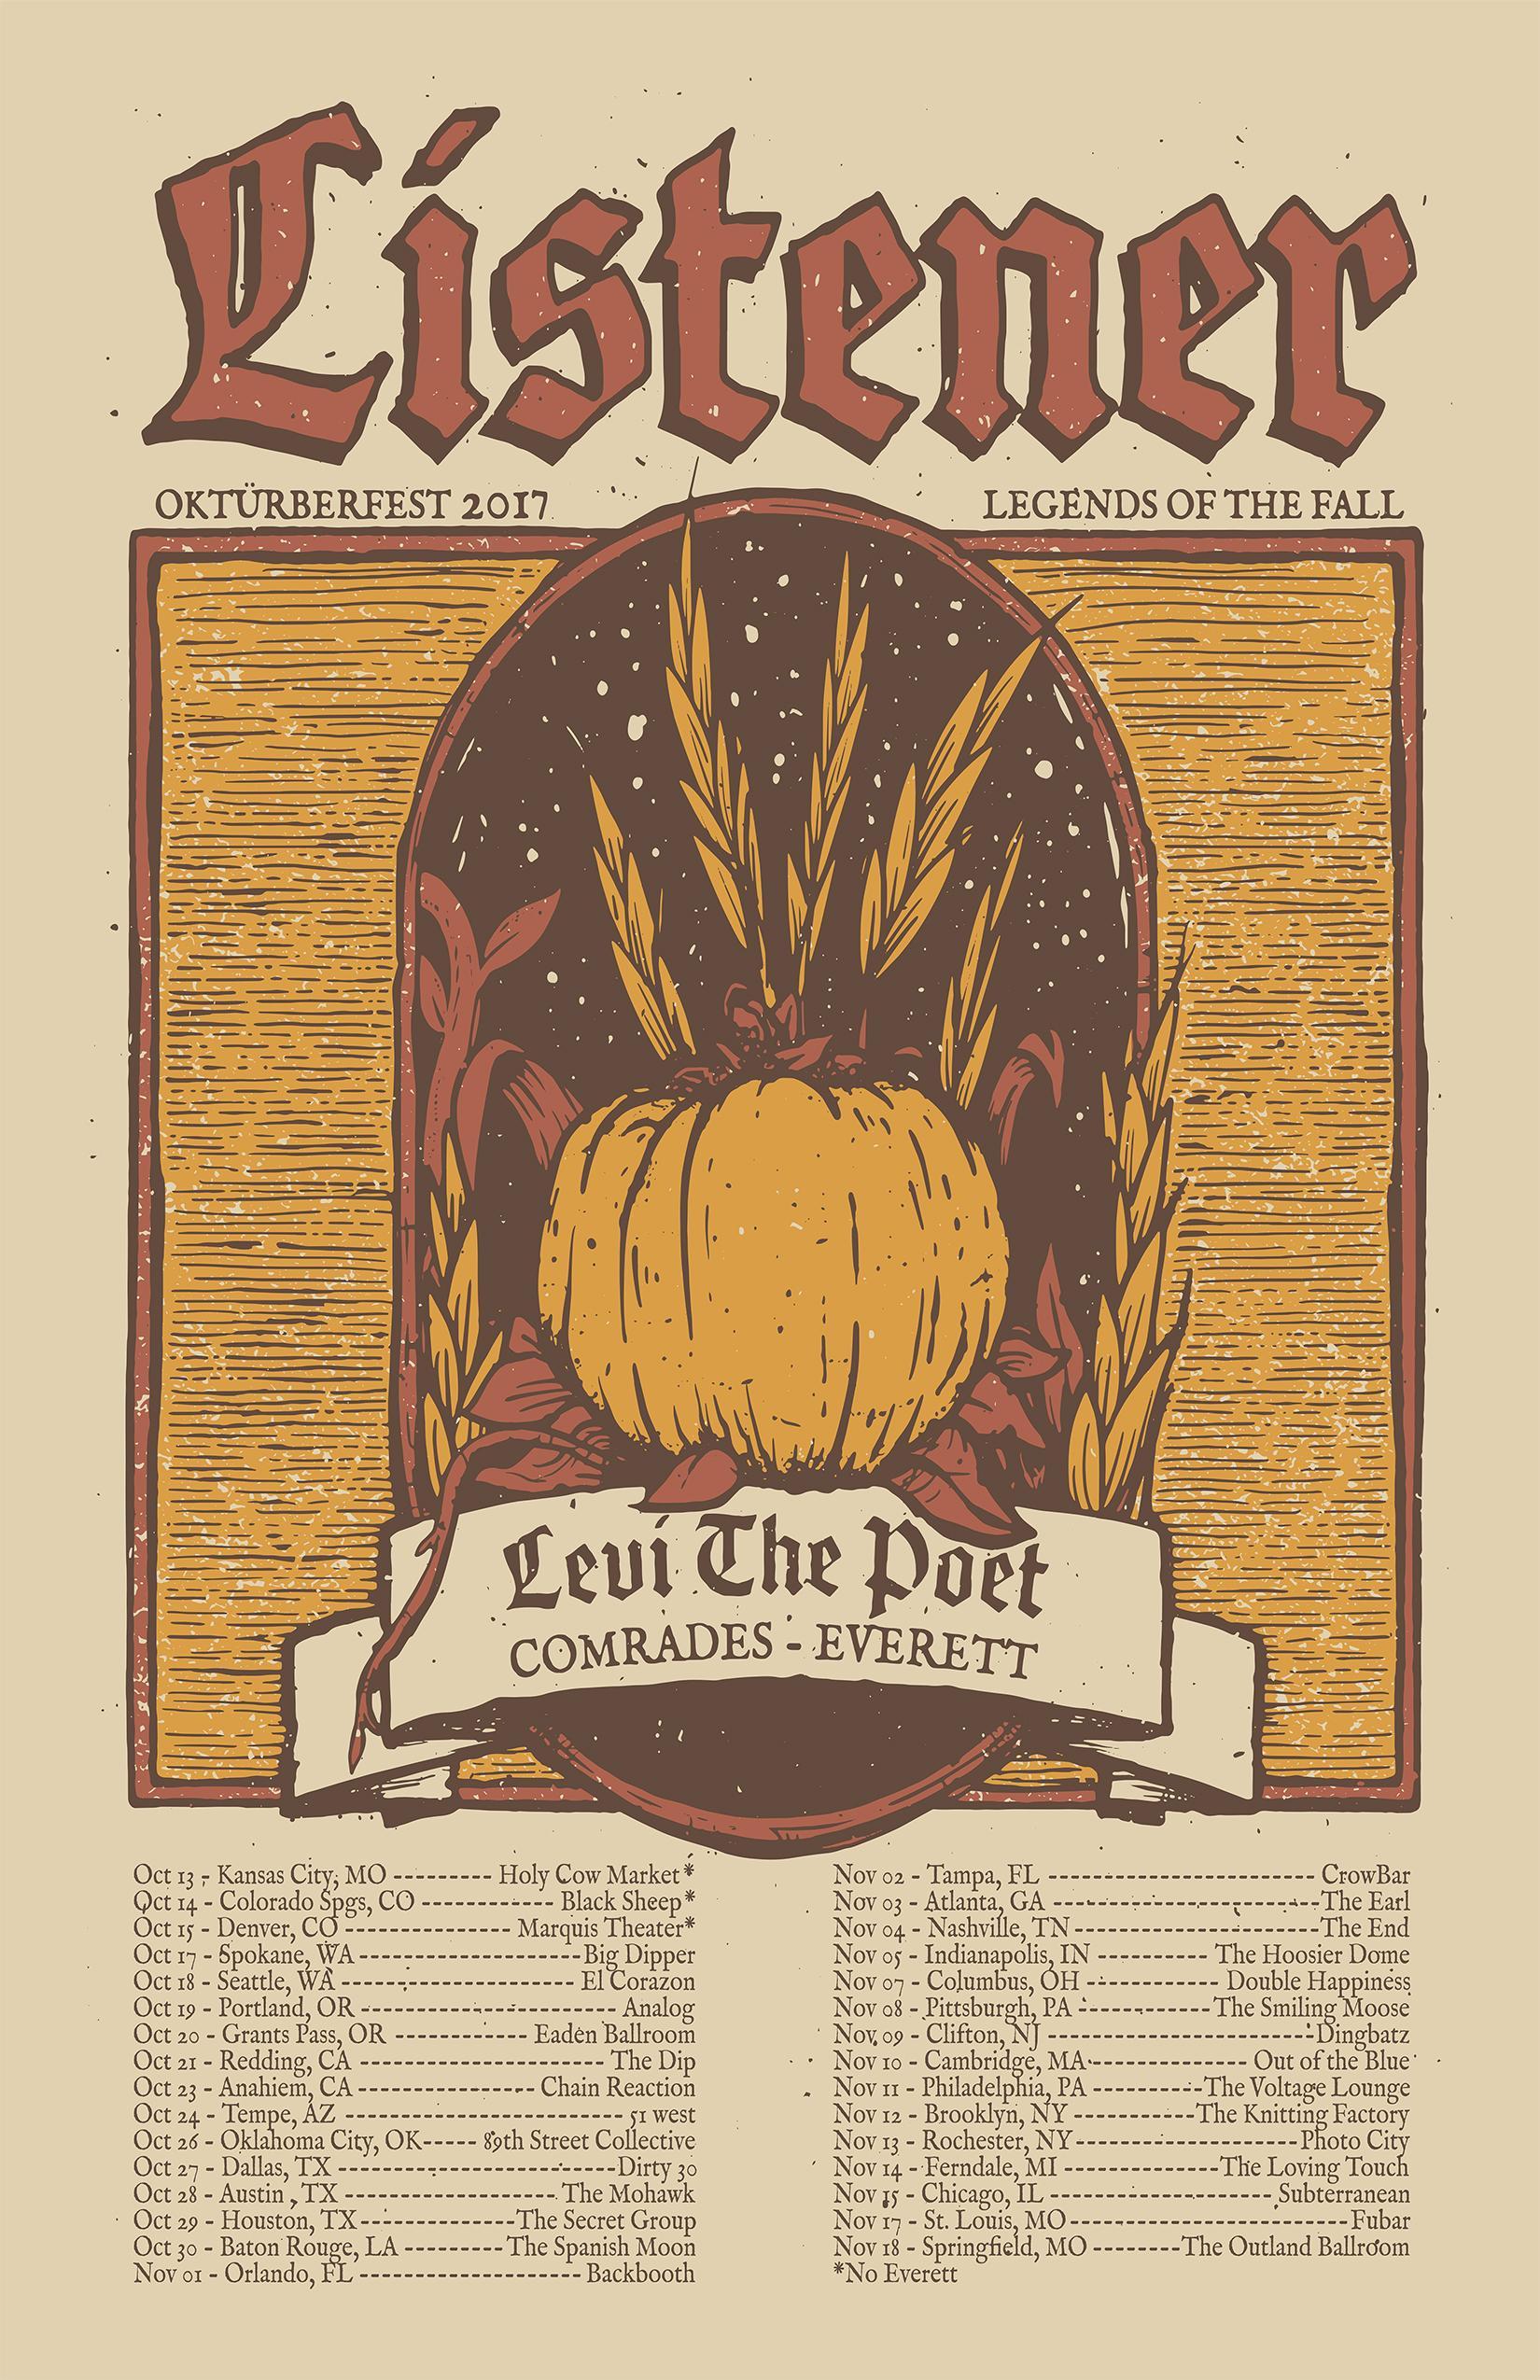 Listener, Levi The Poet, Comrades, & Everett